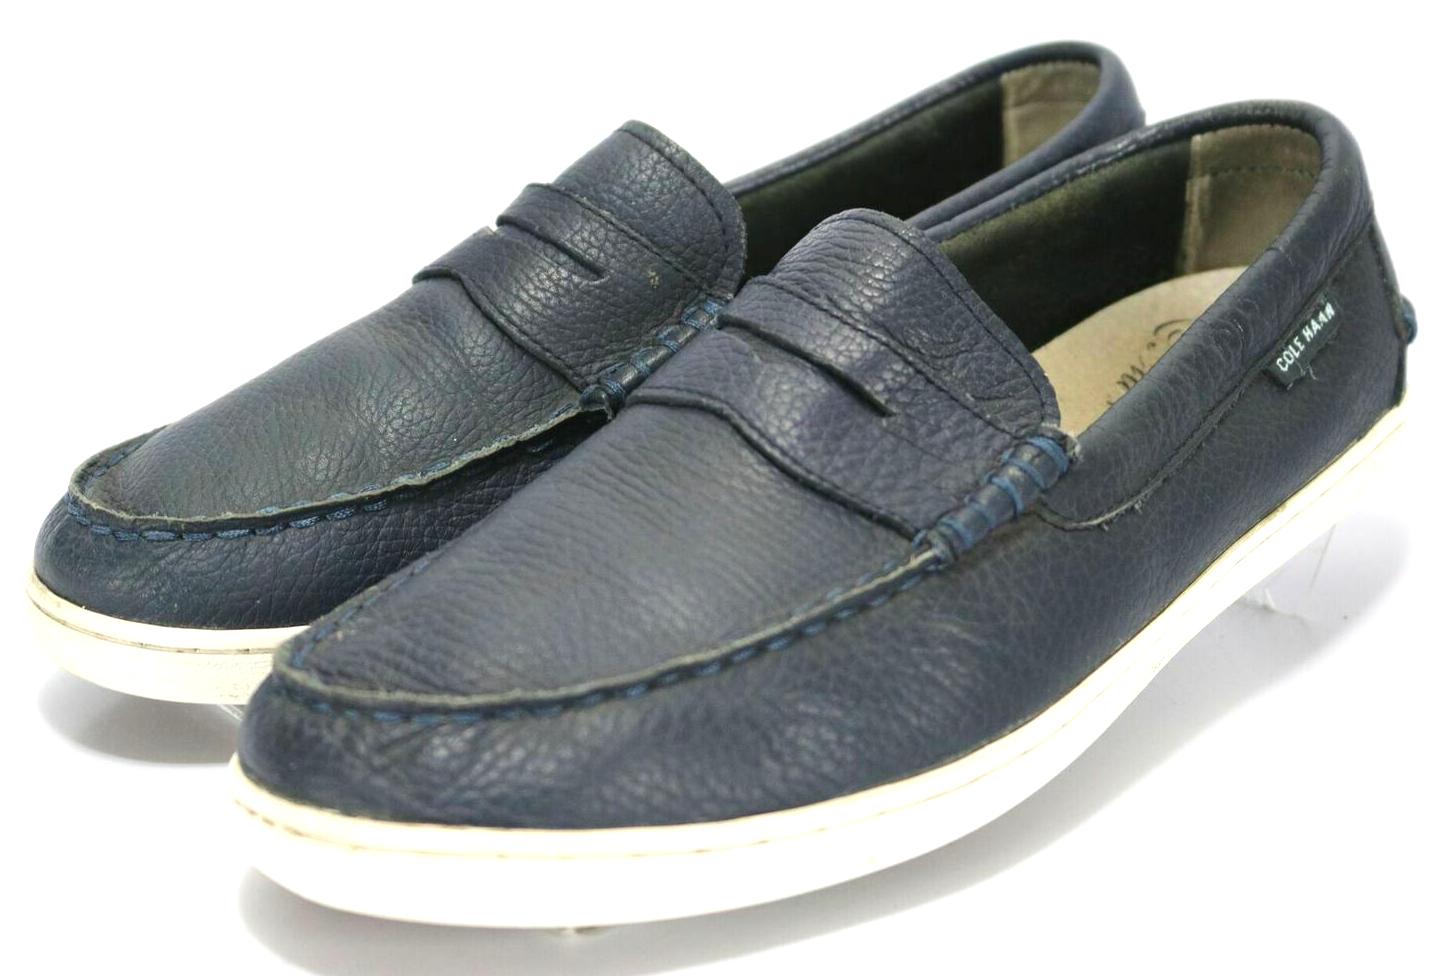 Cole Haan Men's Pinch Weekender  120 Penny Loafers Size 9.5 bluee